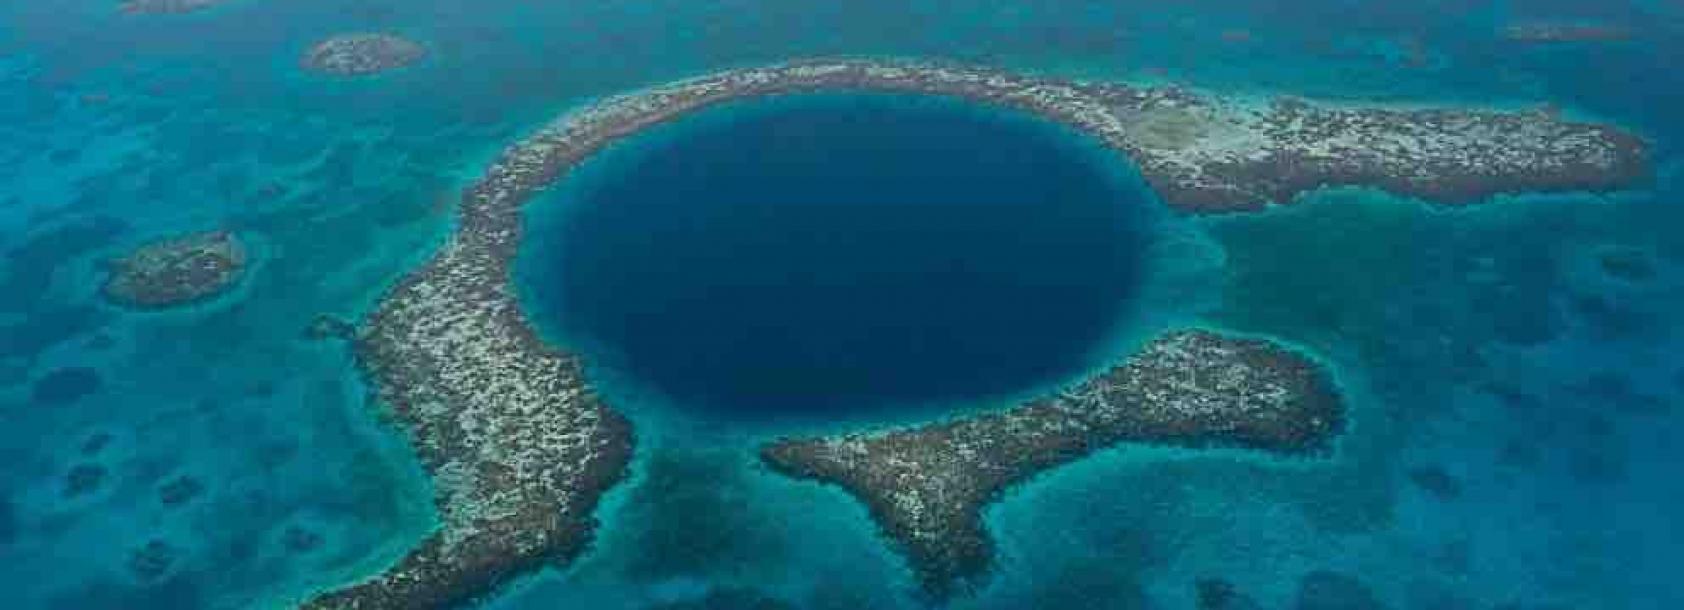 Belize_Blue hole